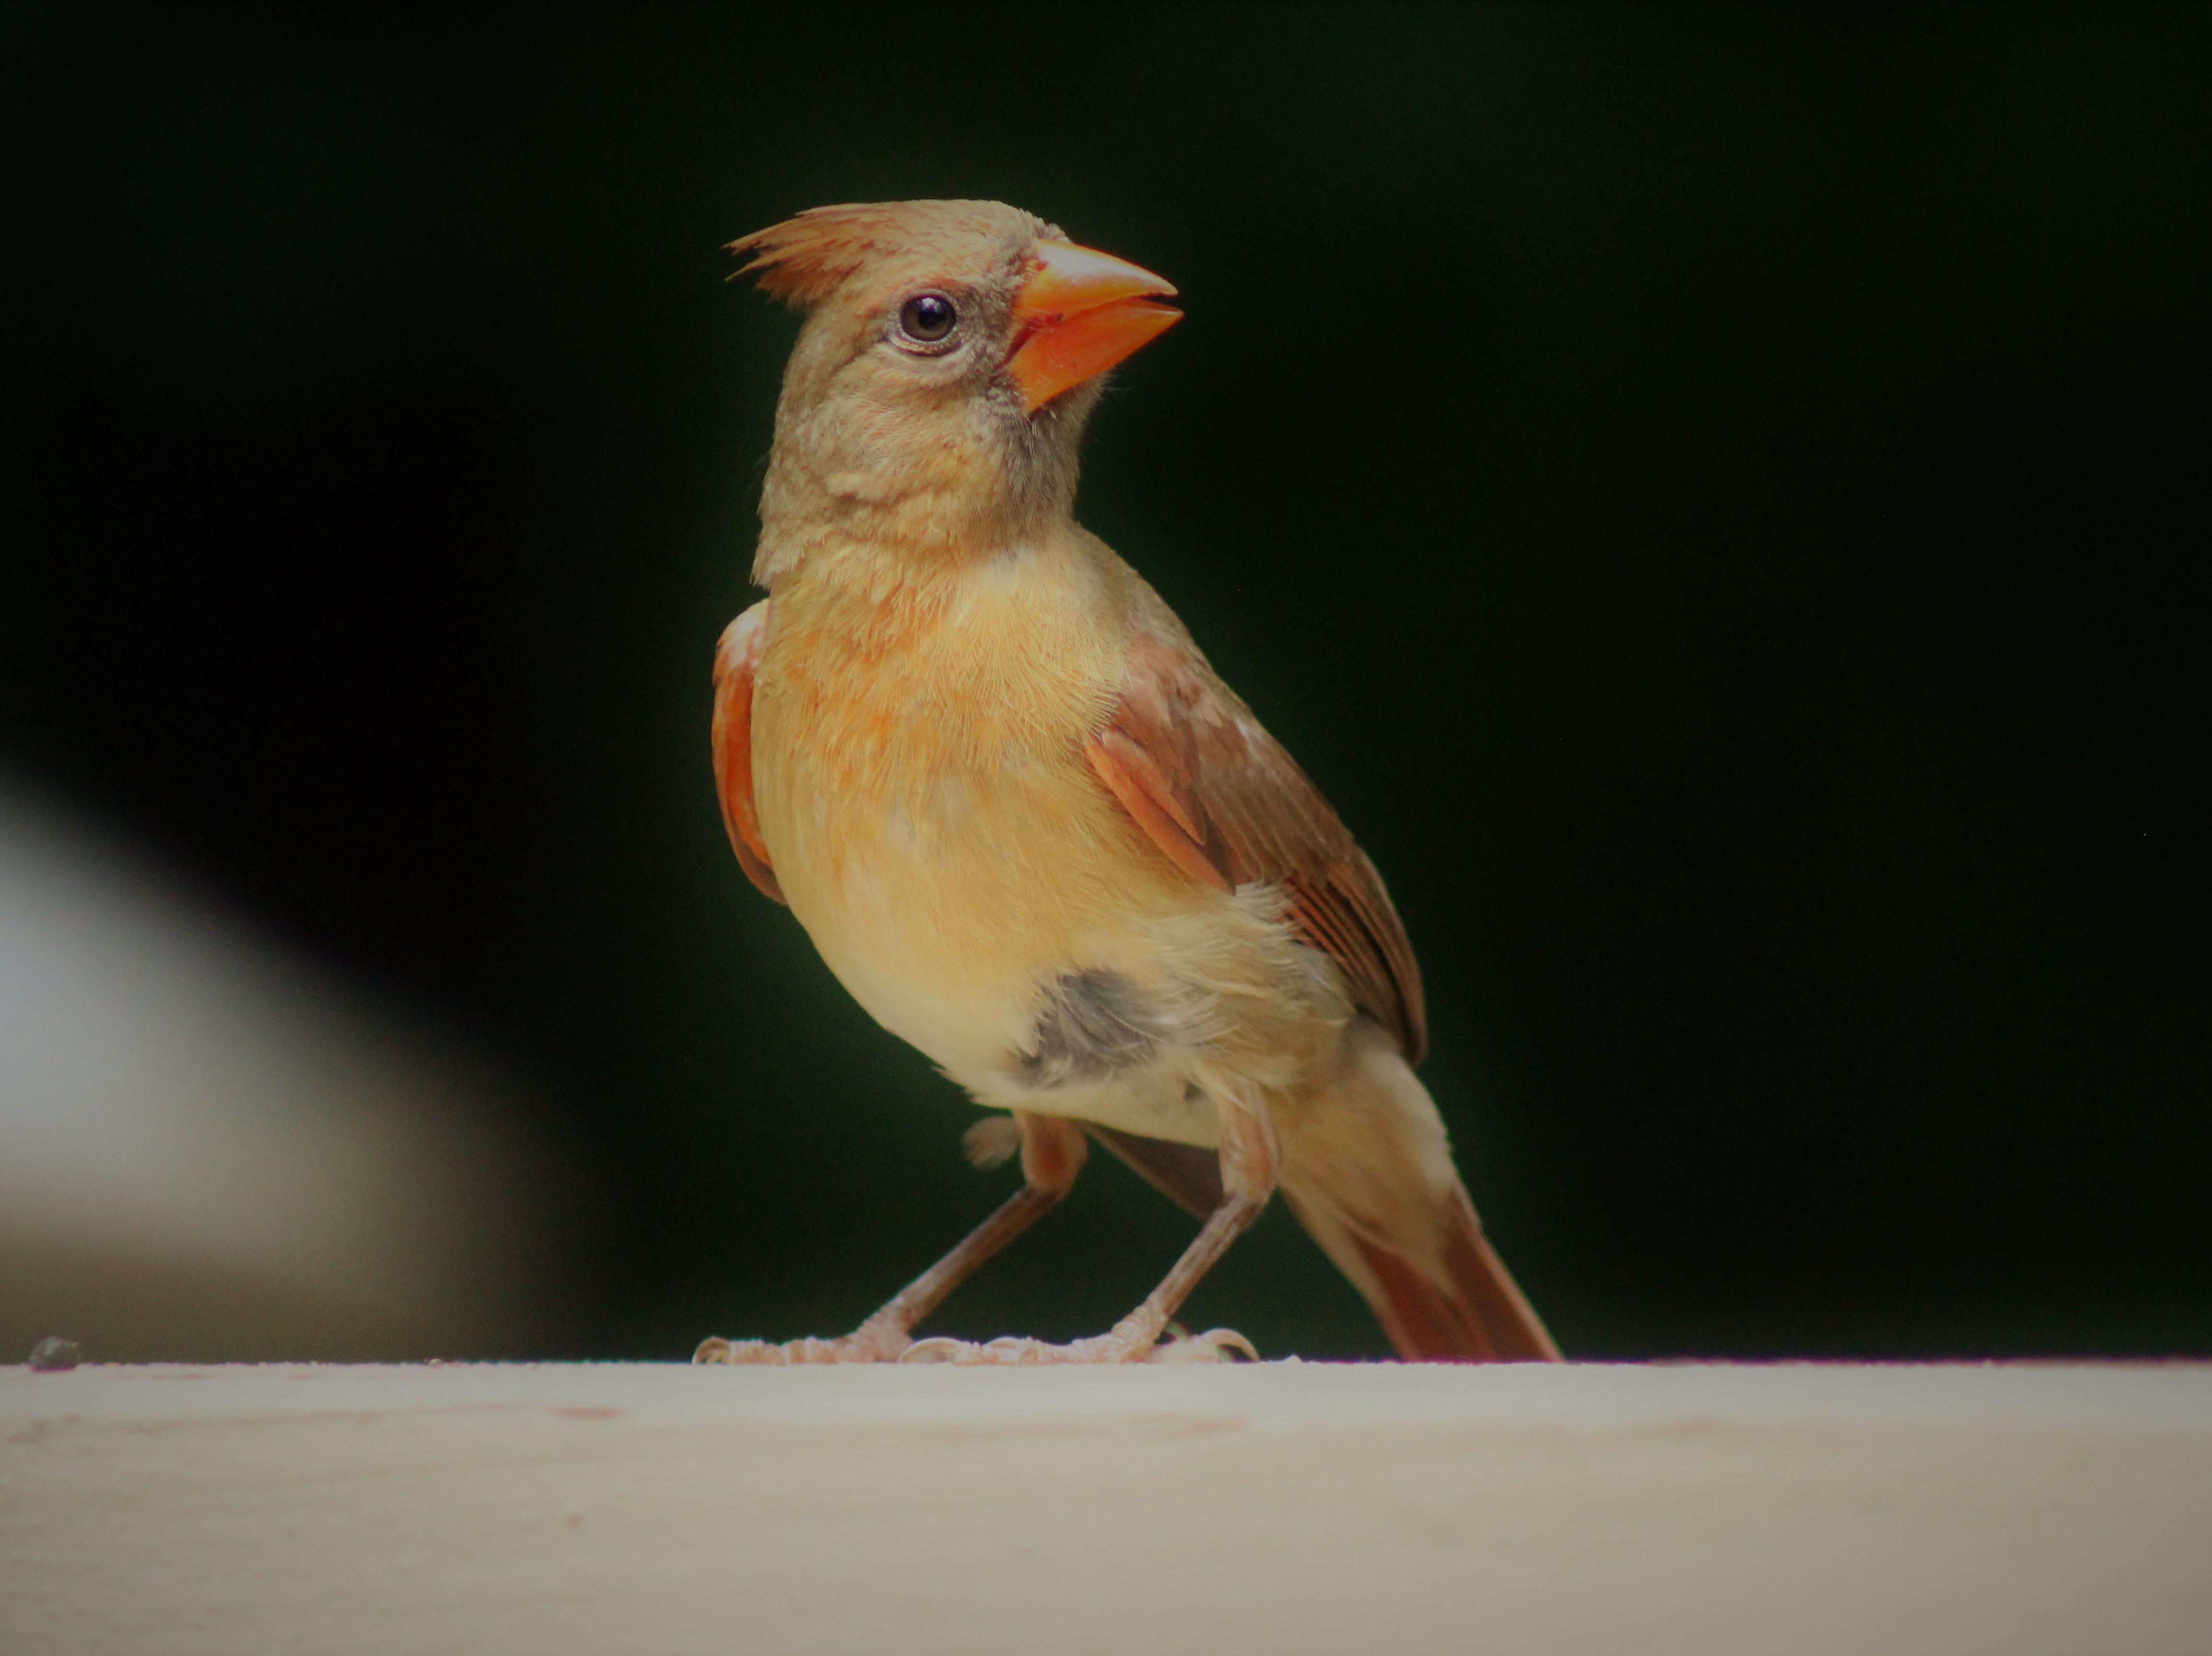 Backyard visitor: Female cardinal enjoying our porch